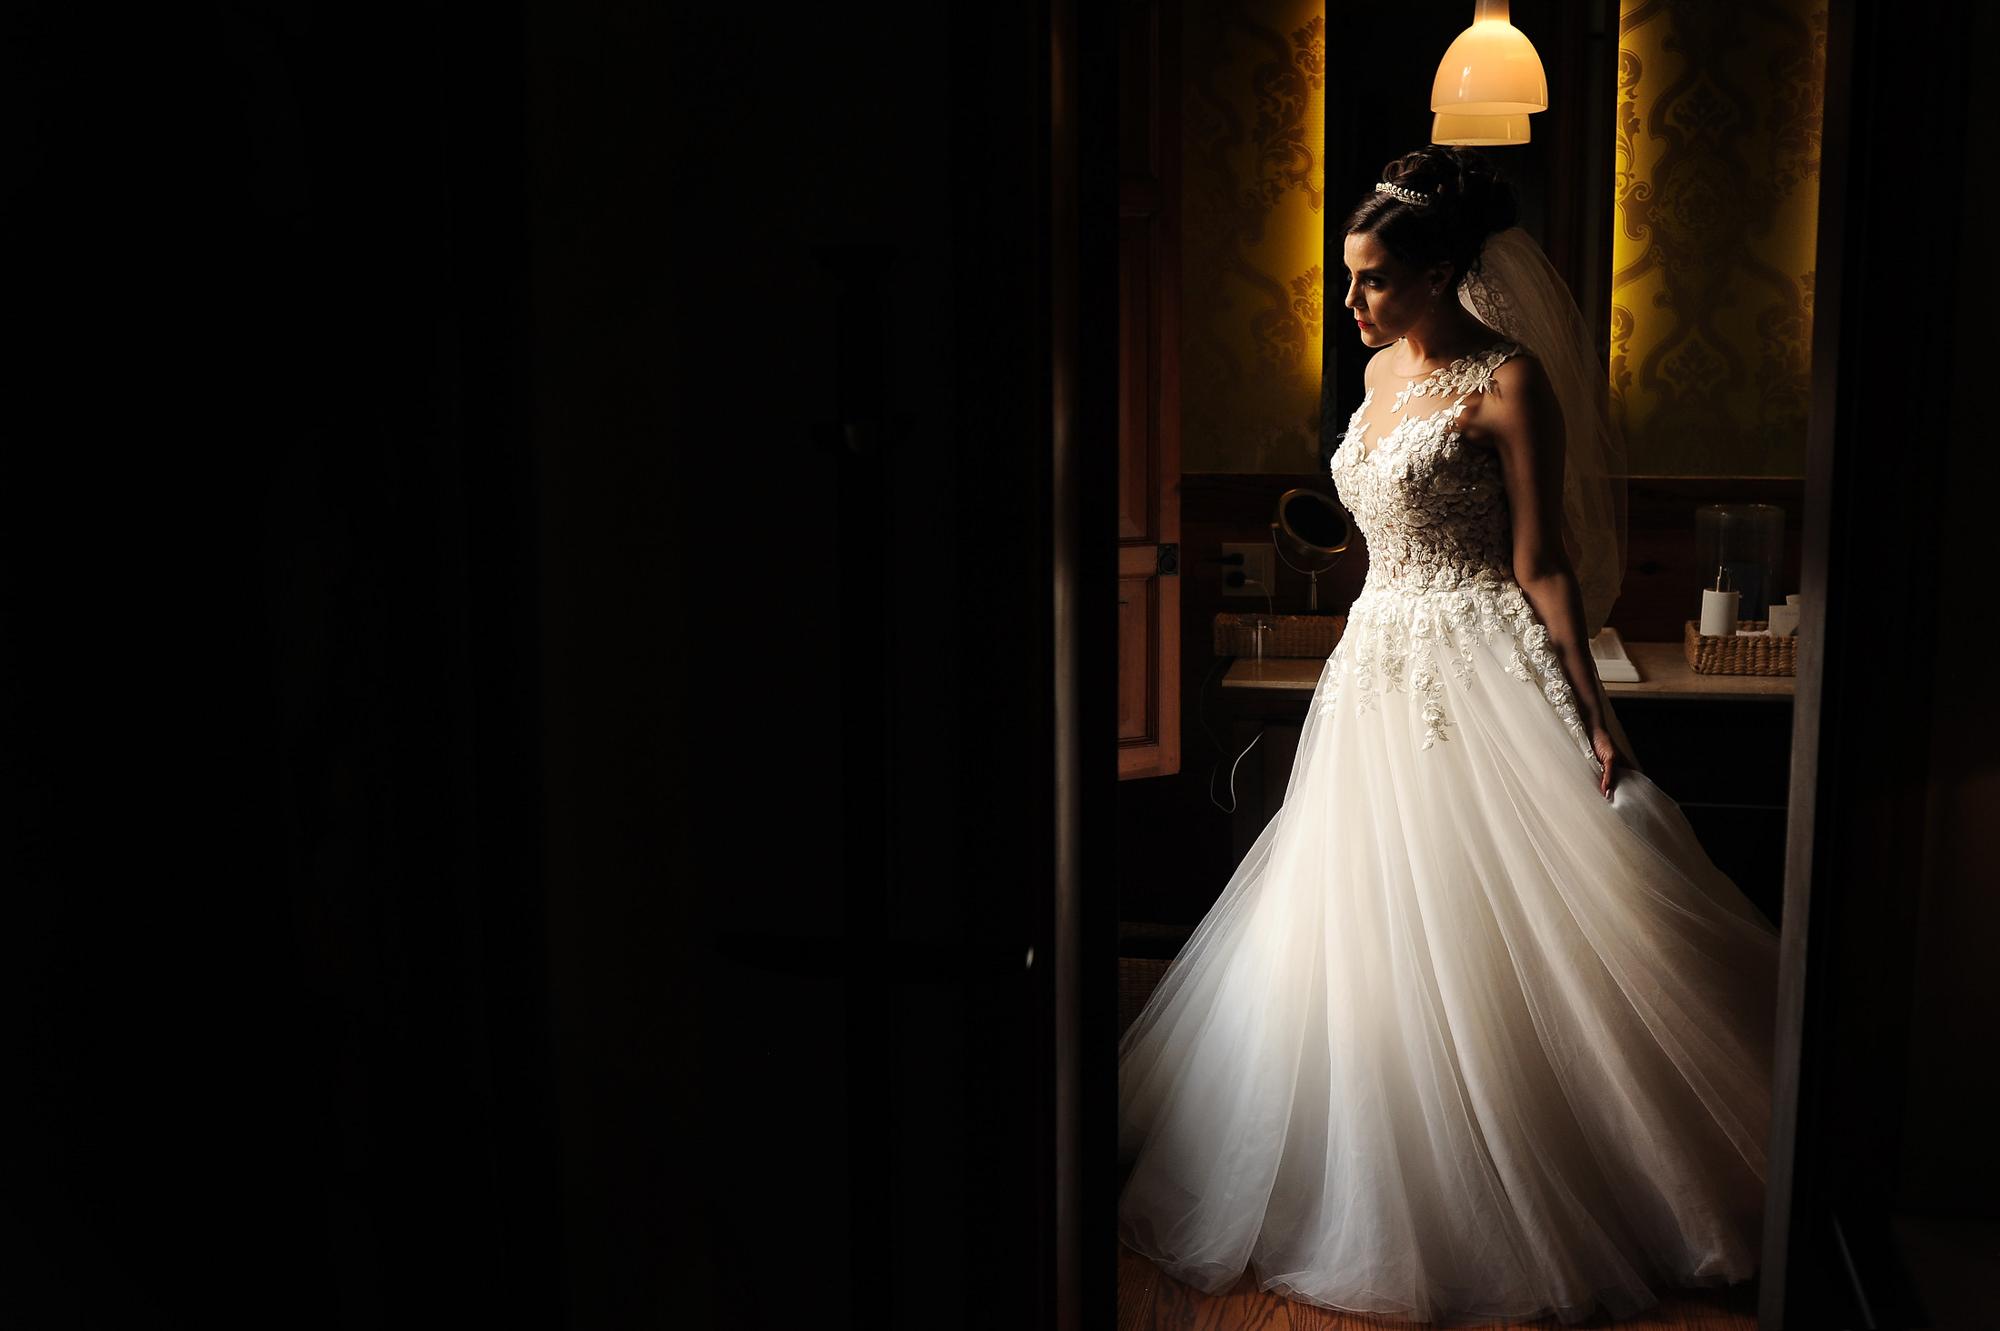 elegant-bride-portrait-window-light-worlds-best-wedding-photos-daniel-aguilar-houston-wedding-photographers